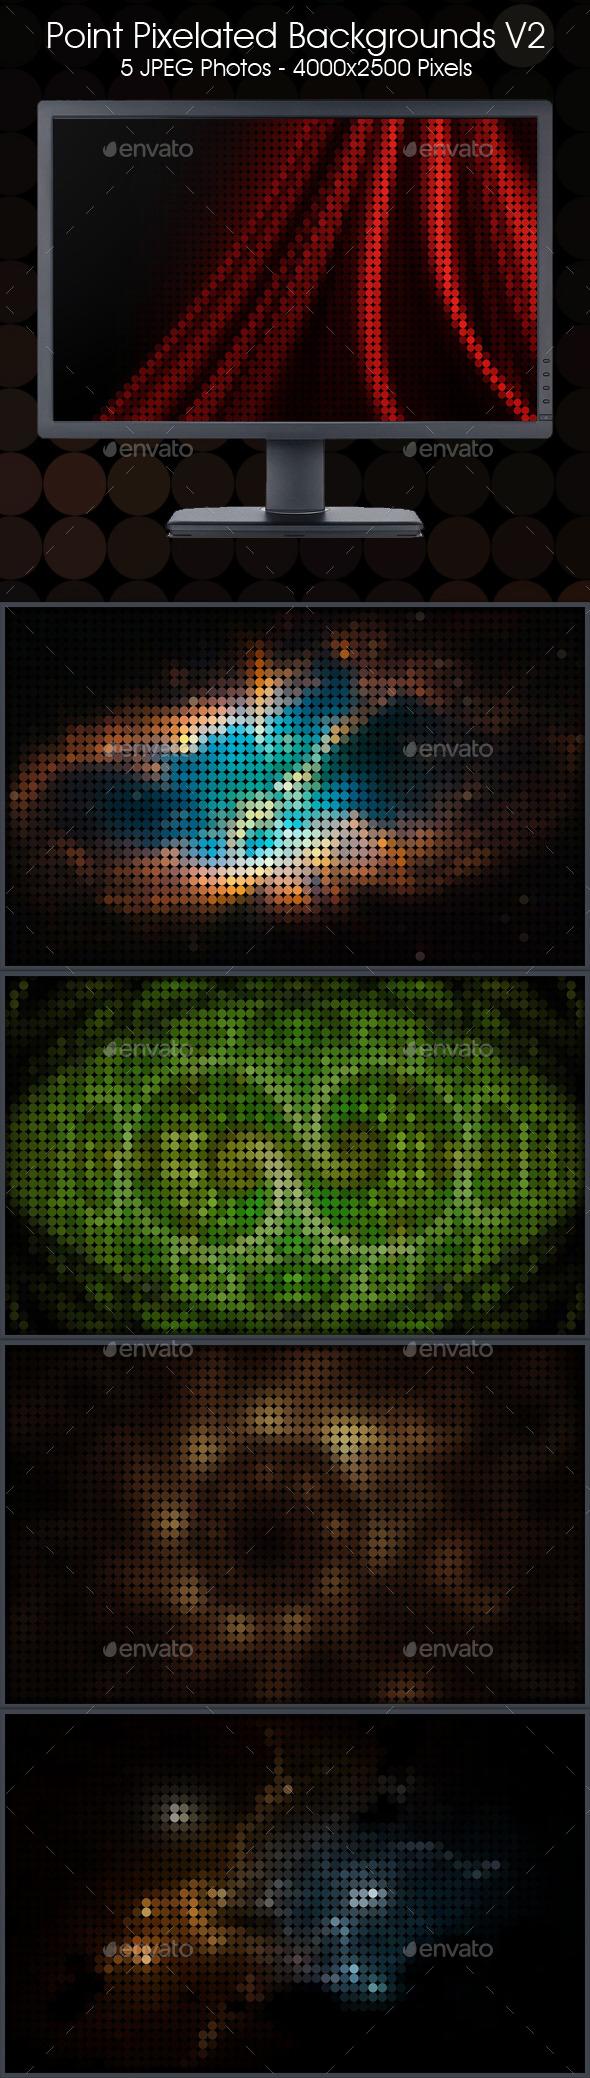 Pixelate Backgrounds V2 - Backgrounds Graphics